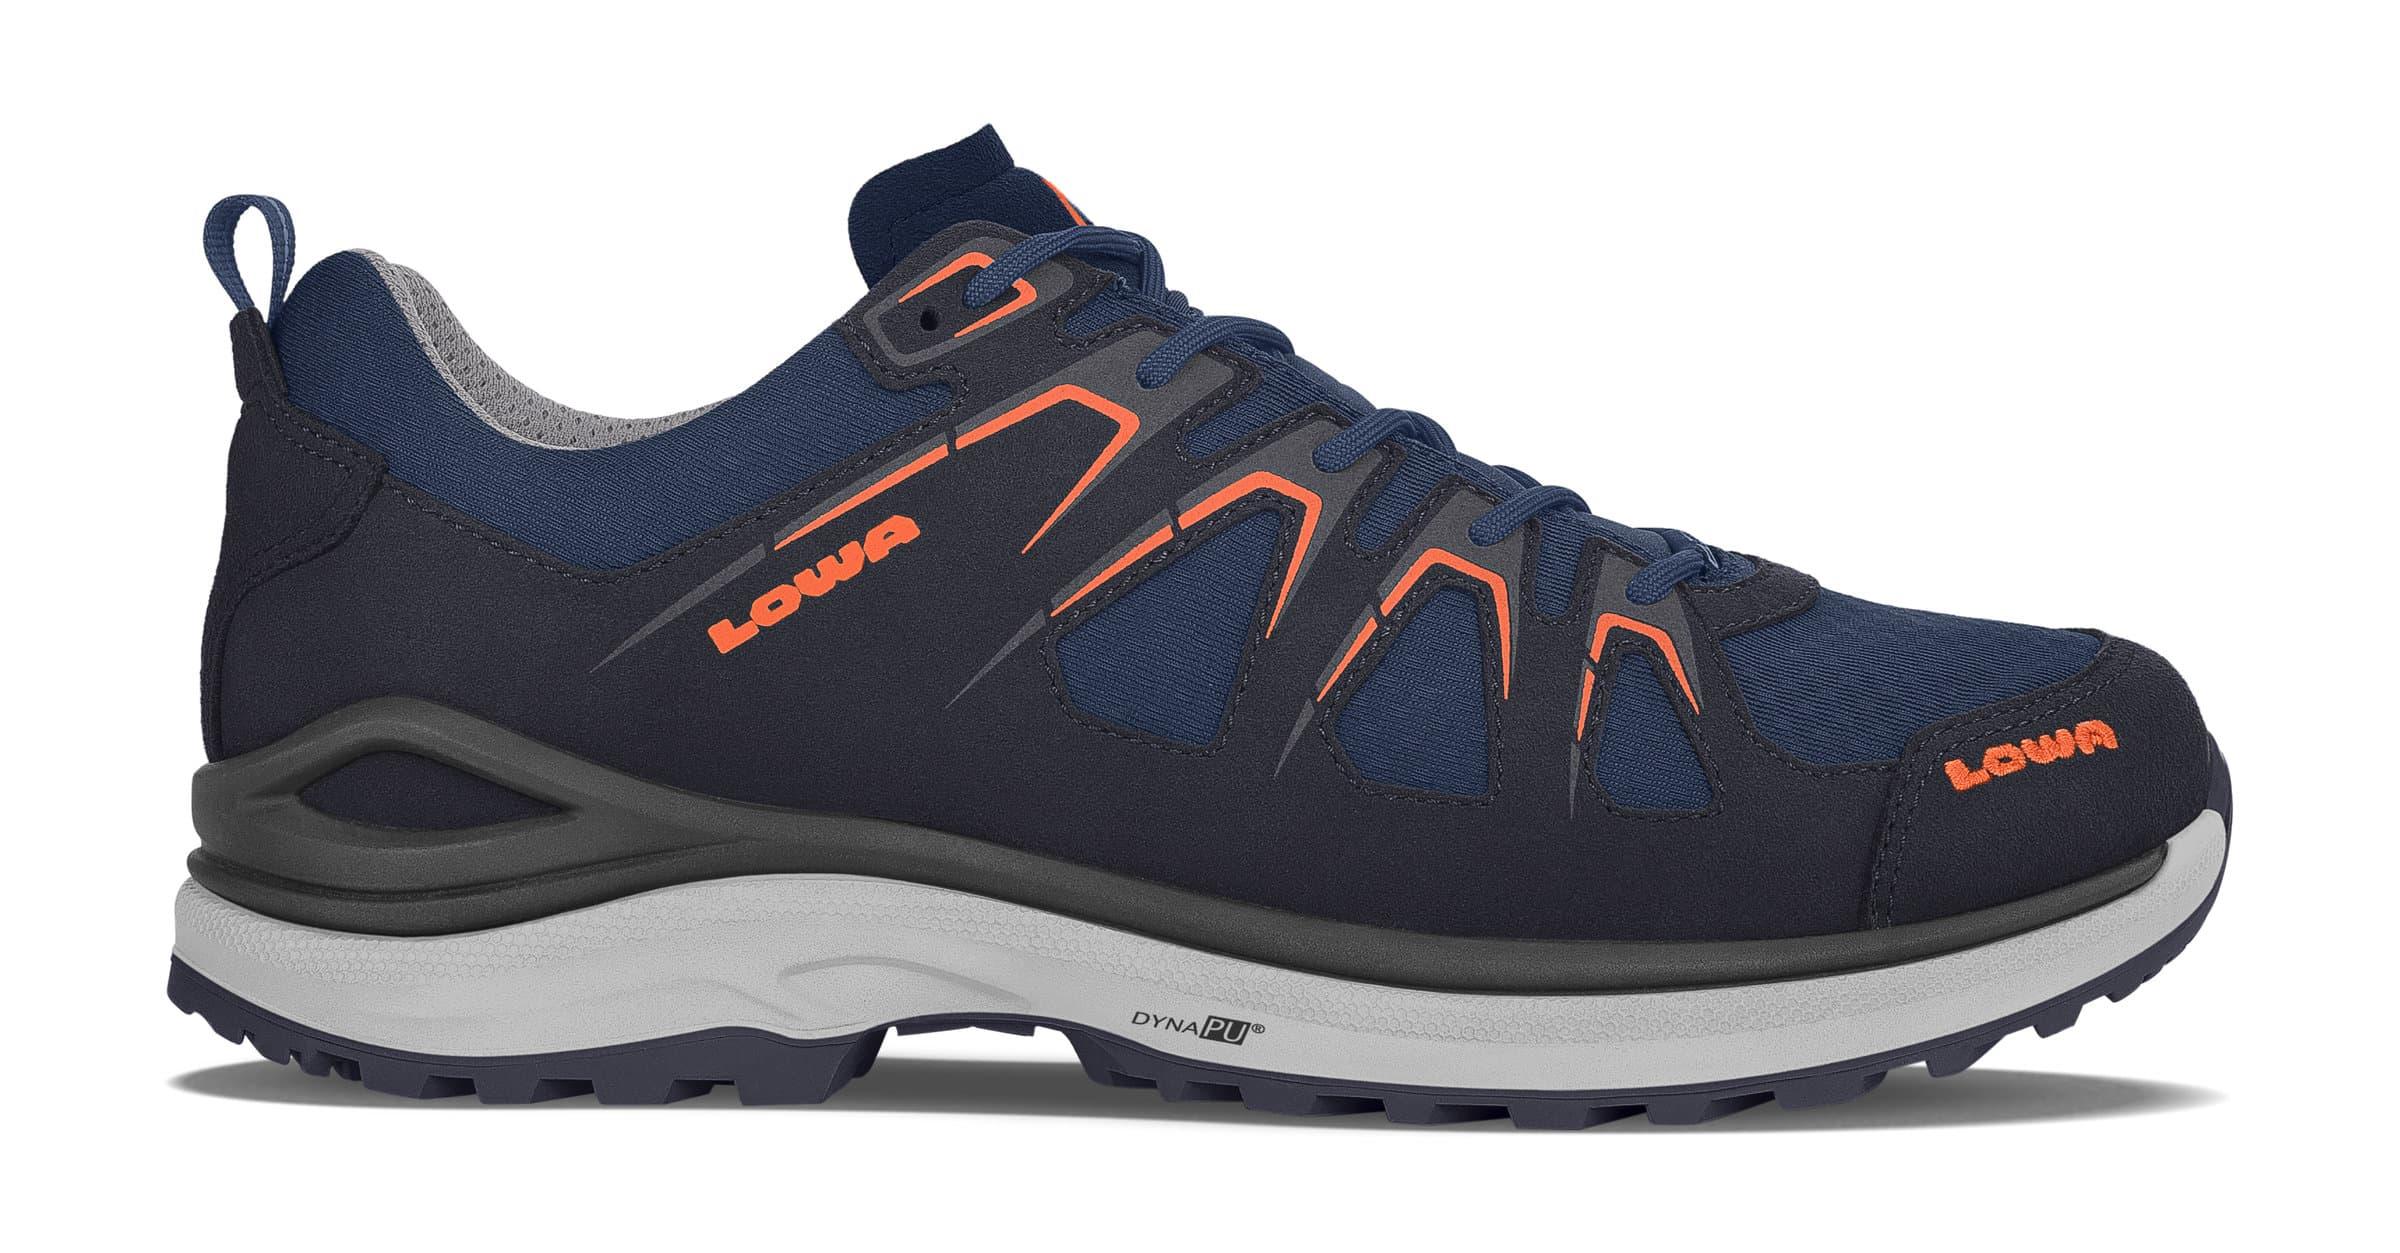 Lowa Innox Evo GTX Lo Chaussures polyvalentes pour homme